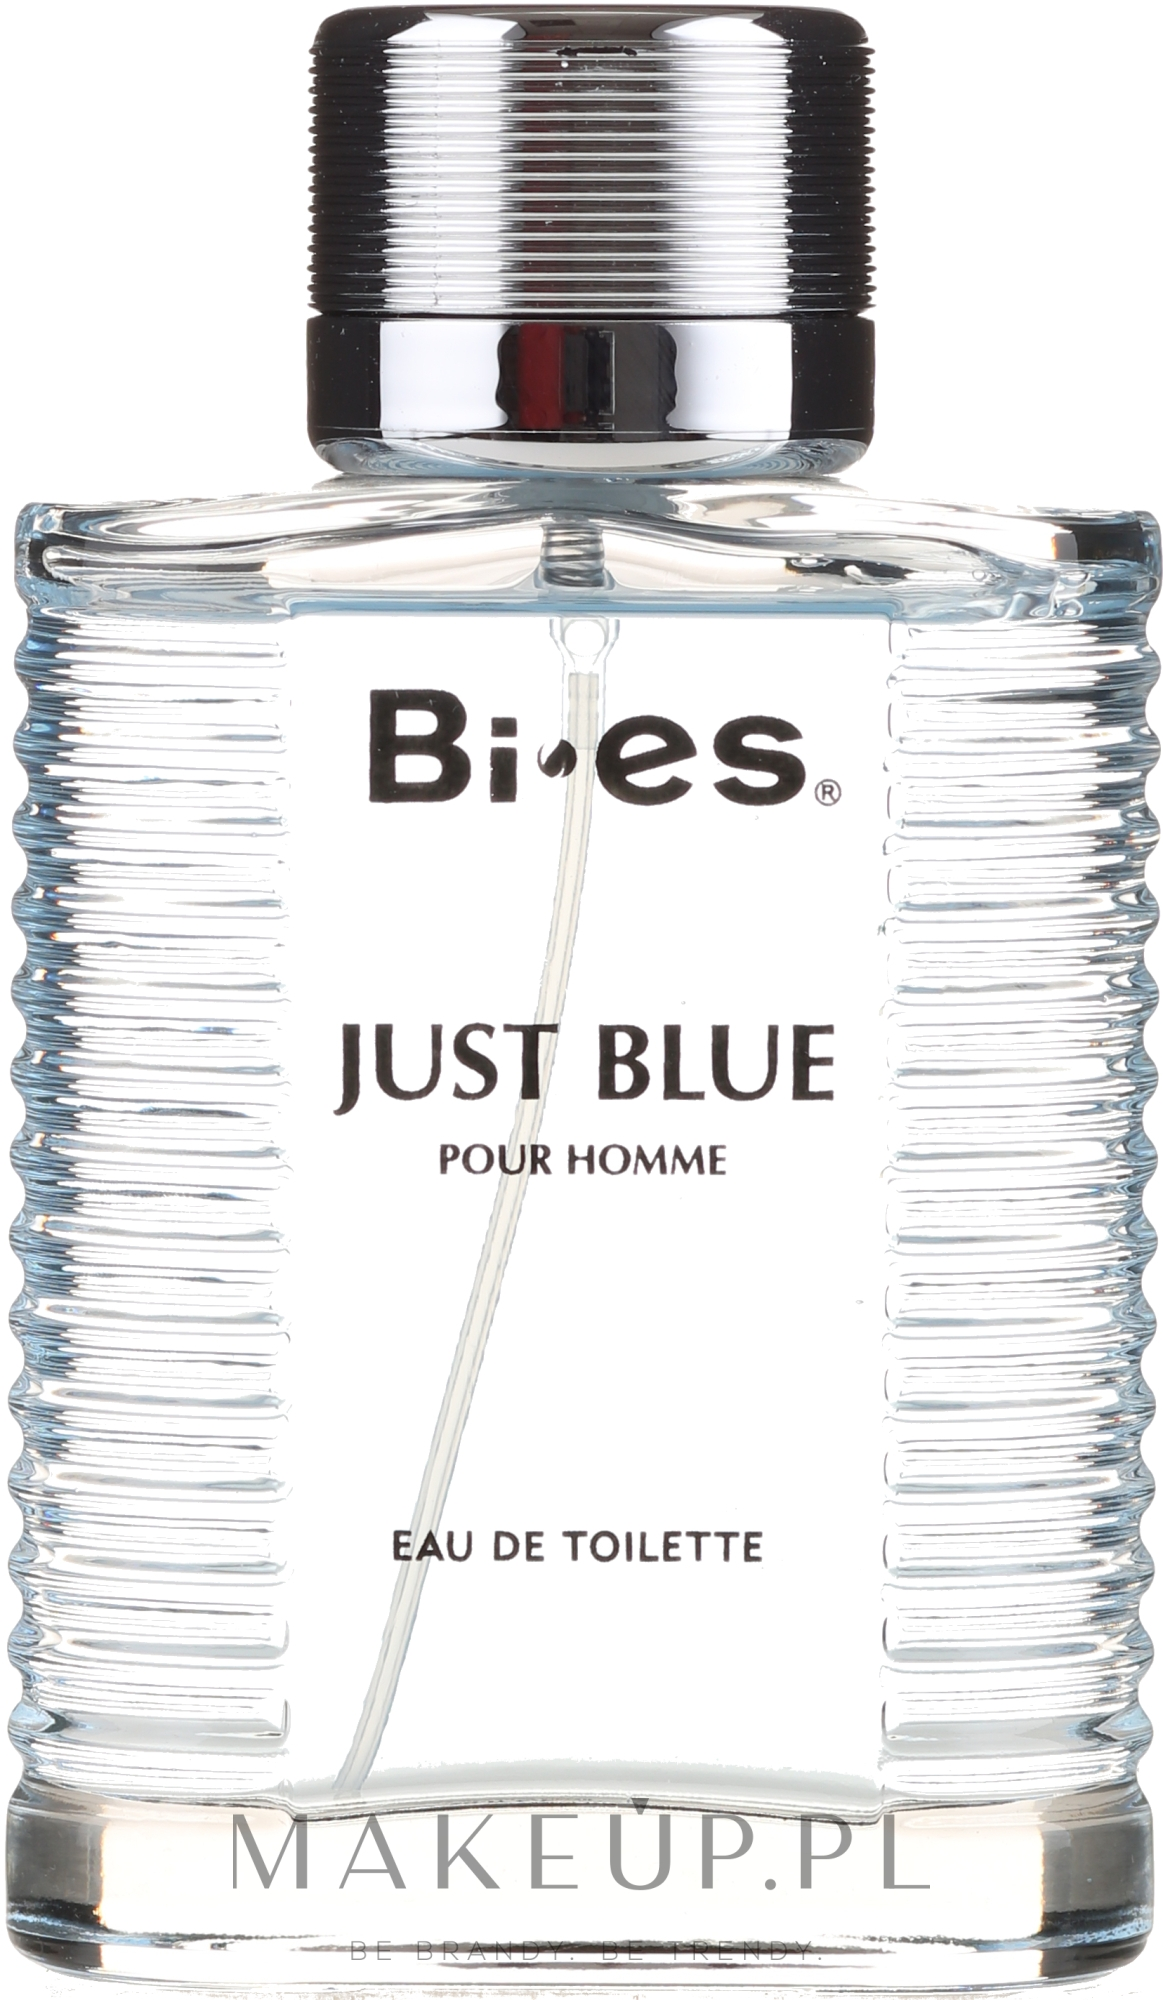 bi-es just blue